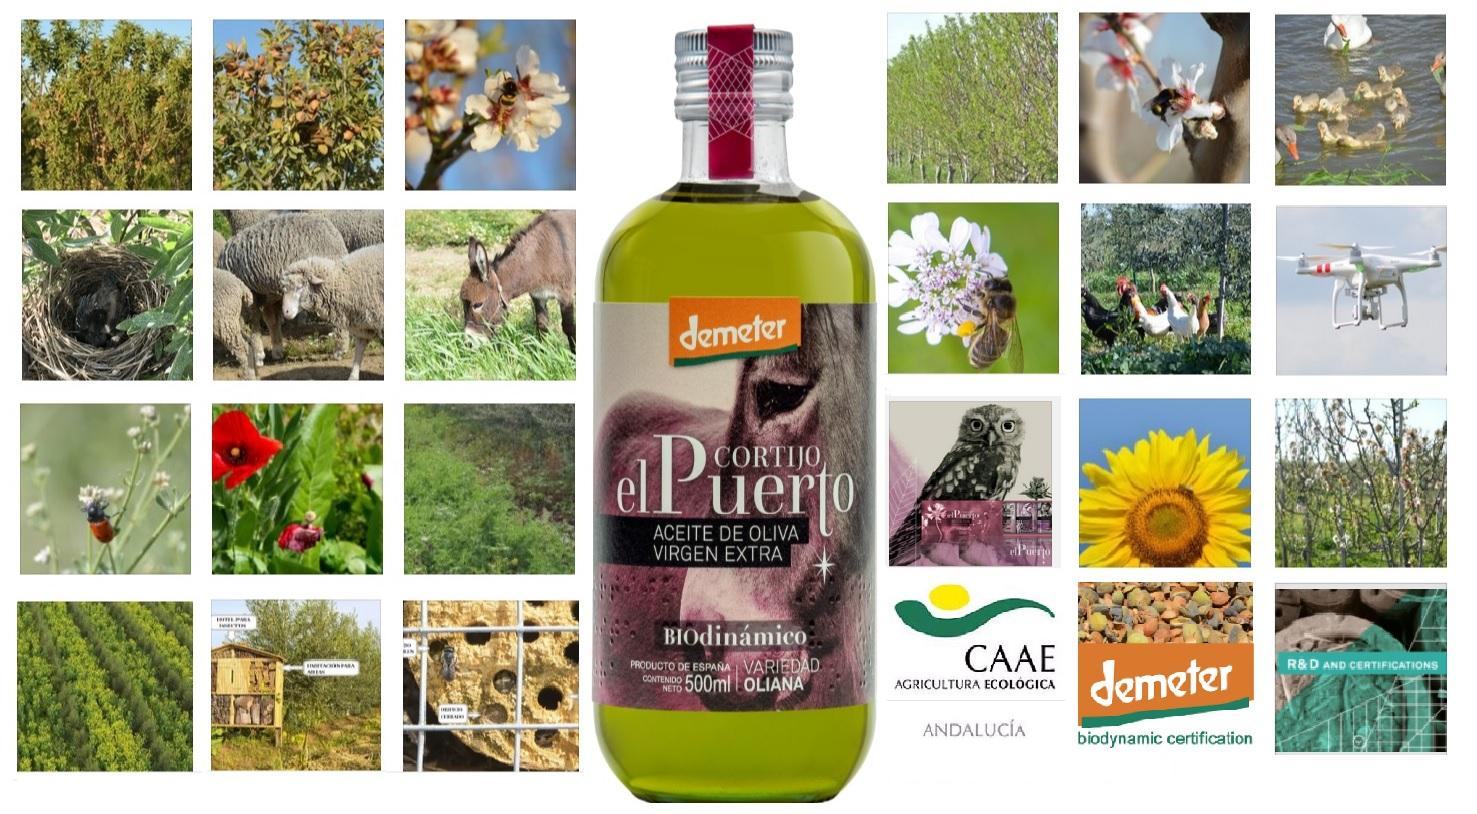 Organic biodynamic EVOO Cortijo el Puerto Biodiversity